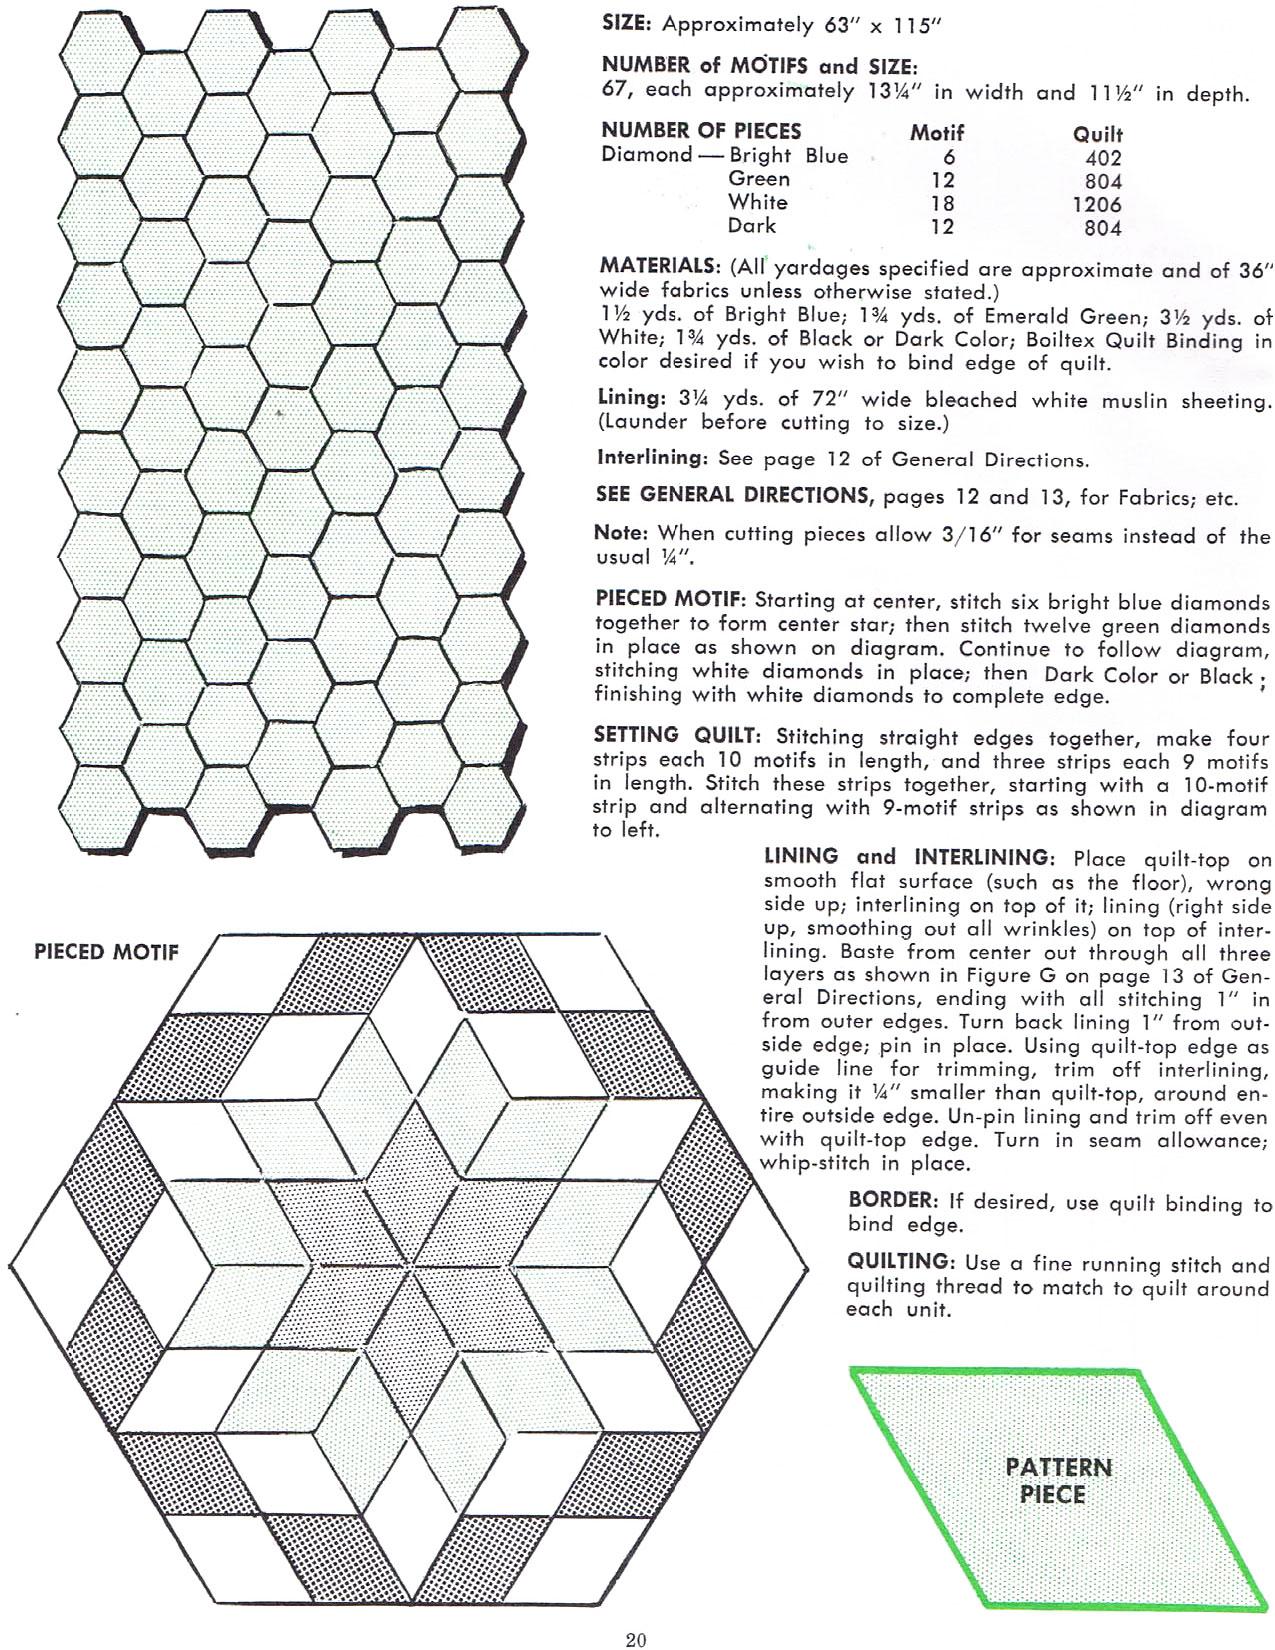 Star Quilts — Vintage Quilt Booklet